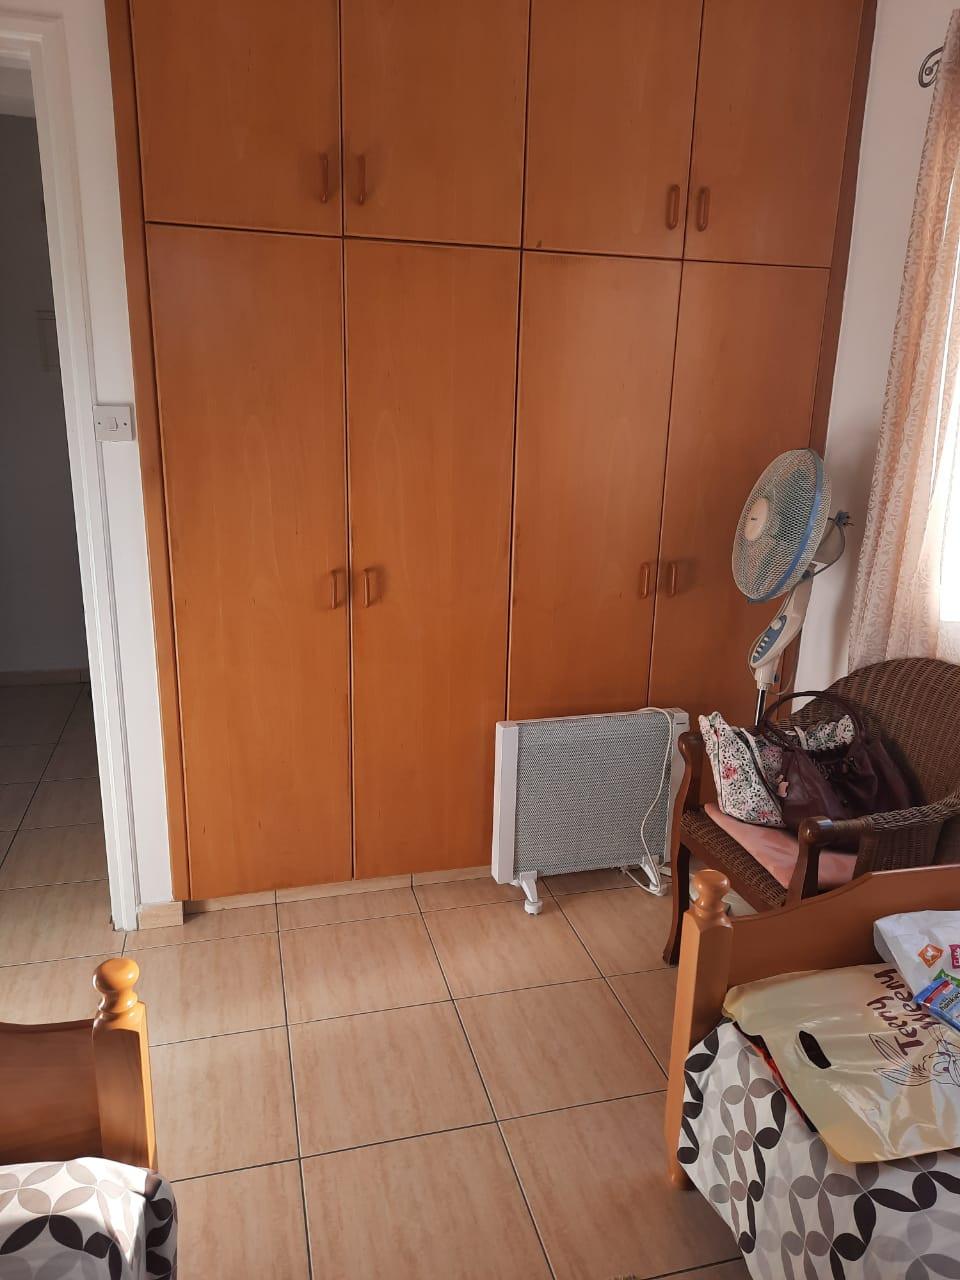 FC-33497: Apartment (Flat) in Mackenzie, Larnaca for Sale - #12